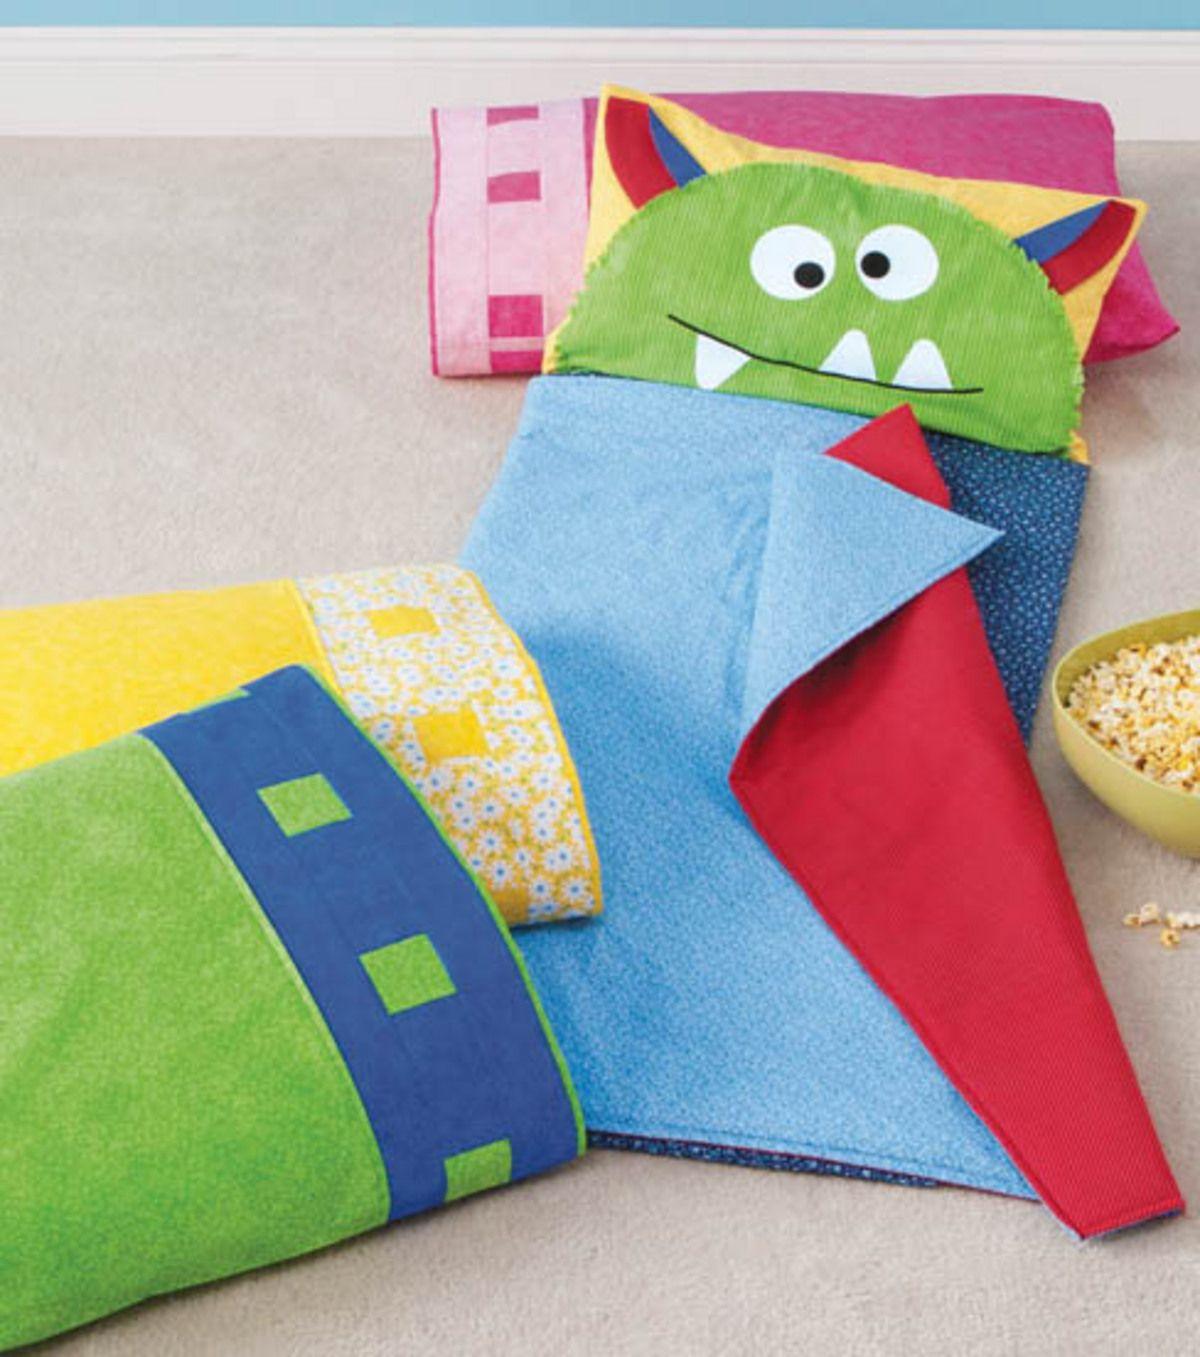 moistureproof pads blanket oxford outdoor sleeping intl camping kids hiking mat cots foldable naturehike buy mats